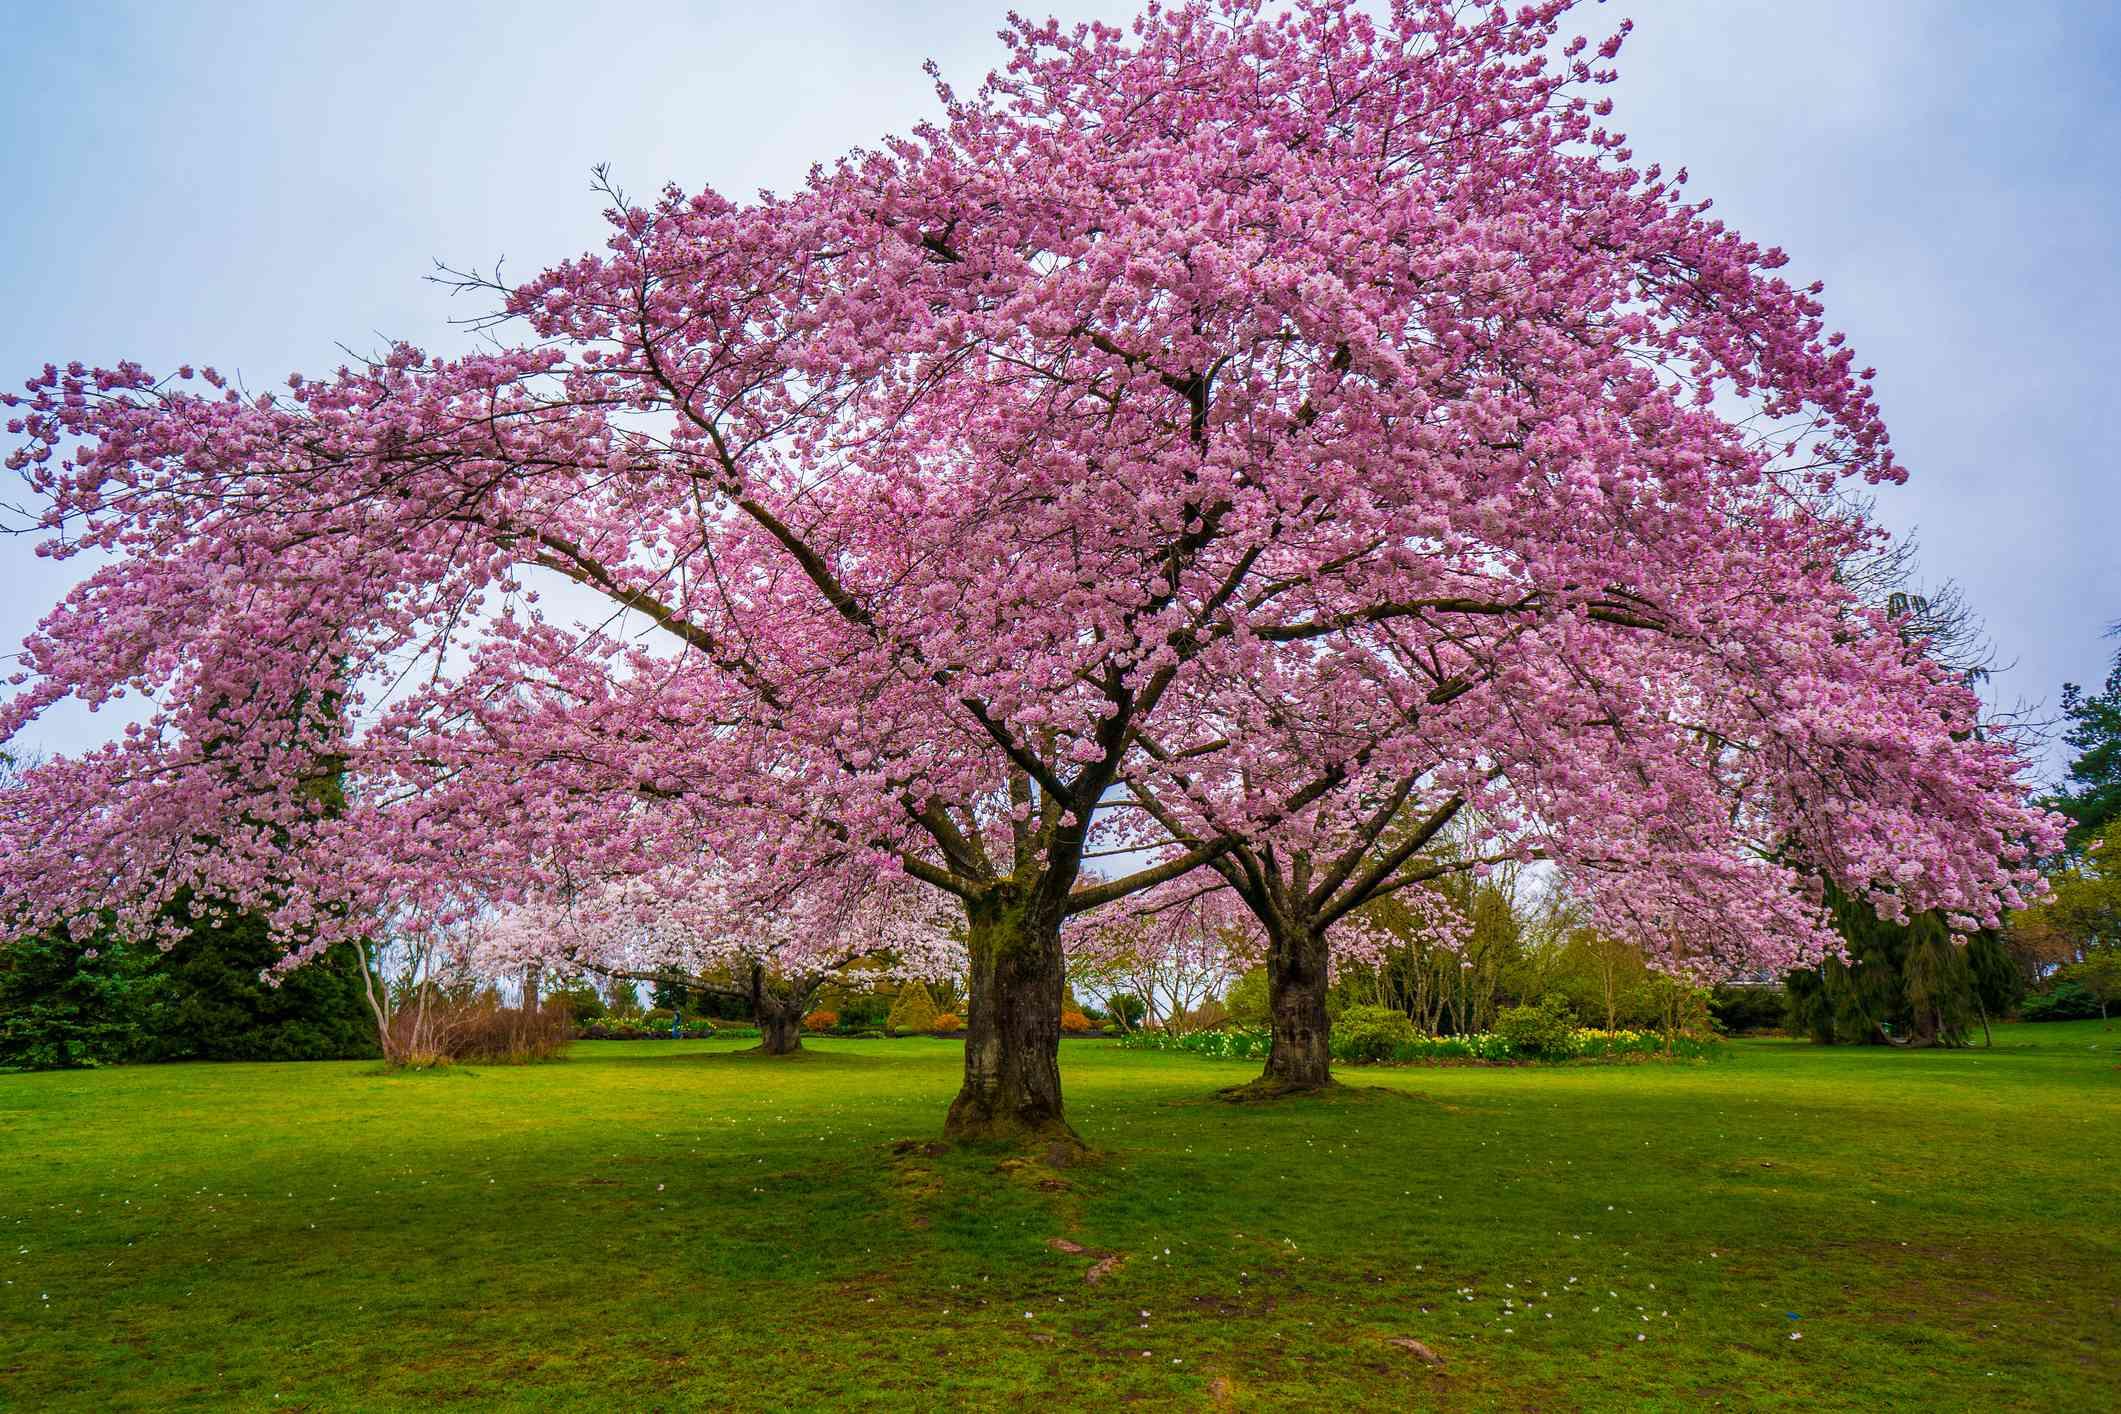 Cherry Blossoms in Queen Elizabeth Park, Vancouver